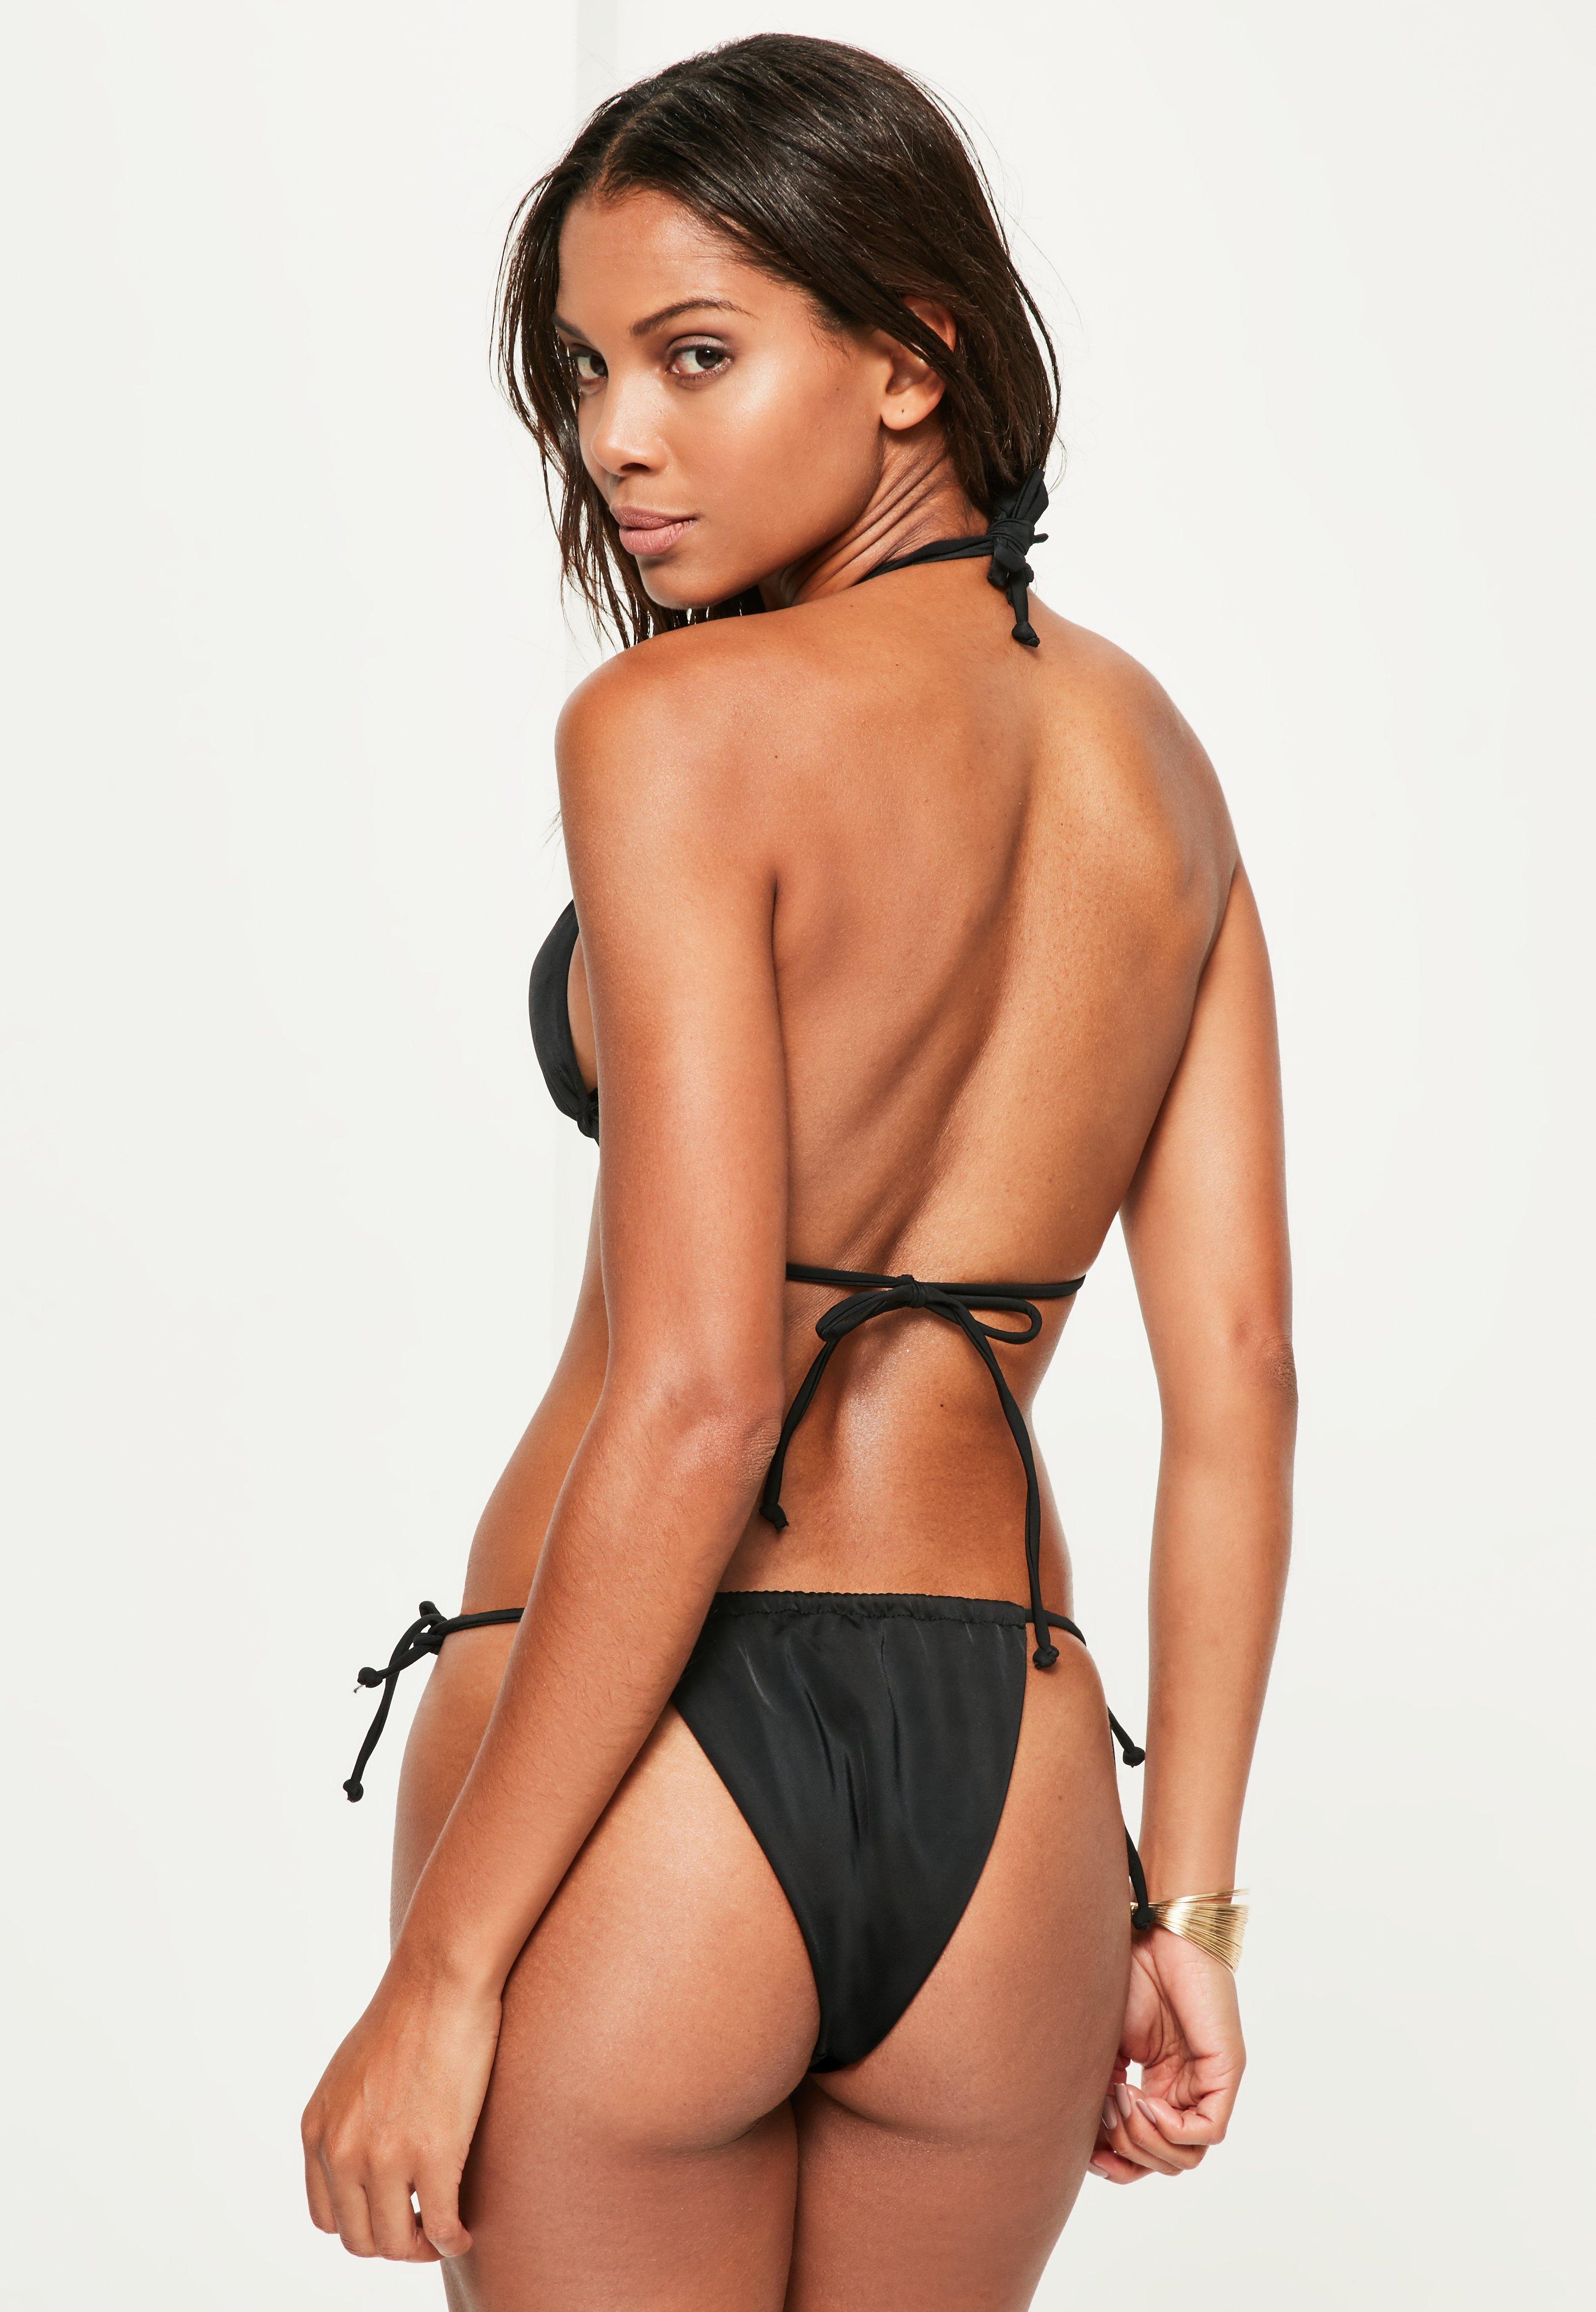 Alyssa milano naked at celebrity scandal